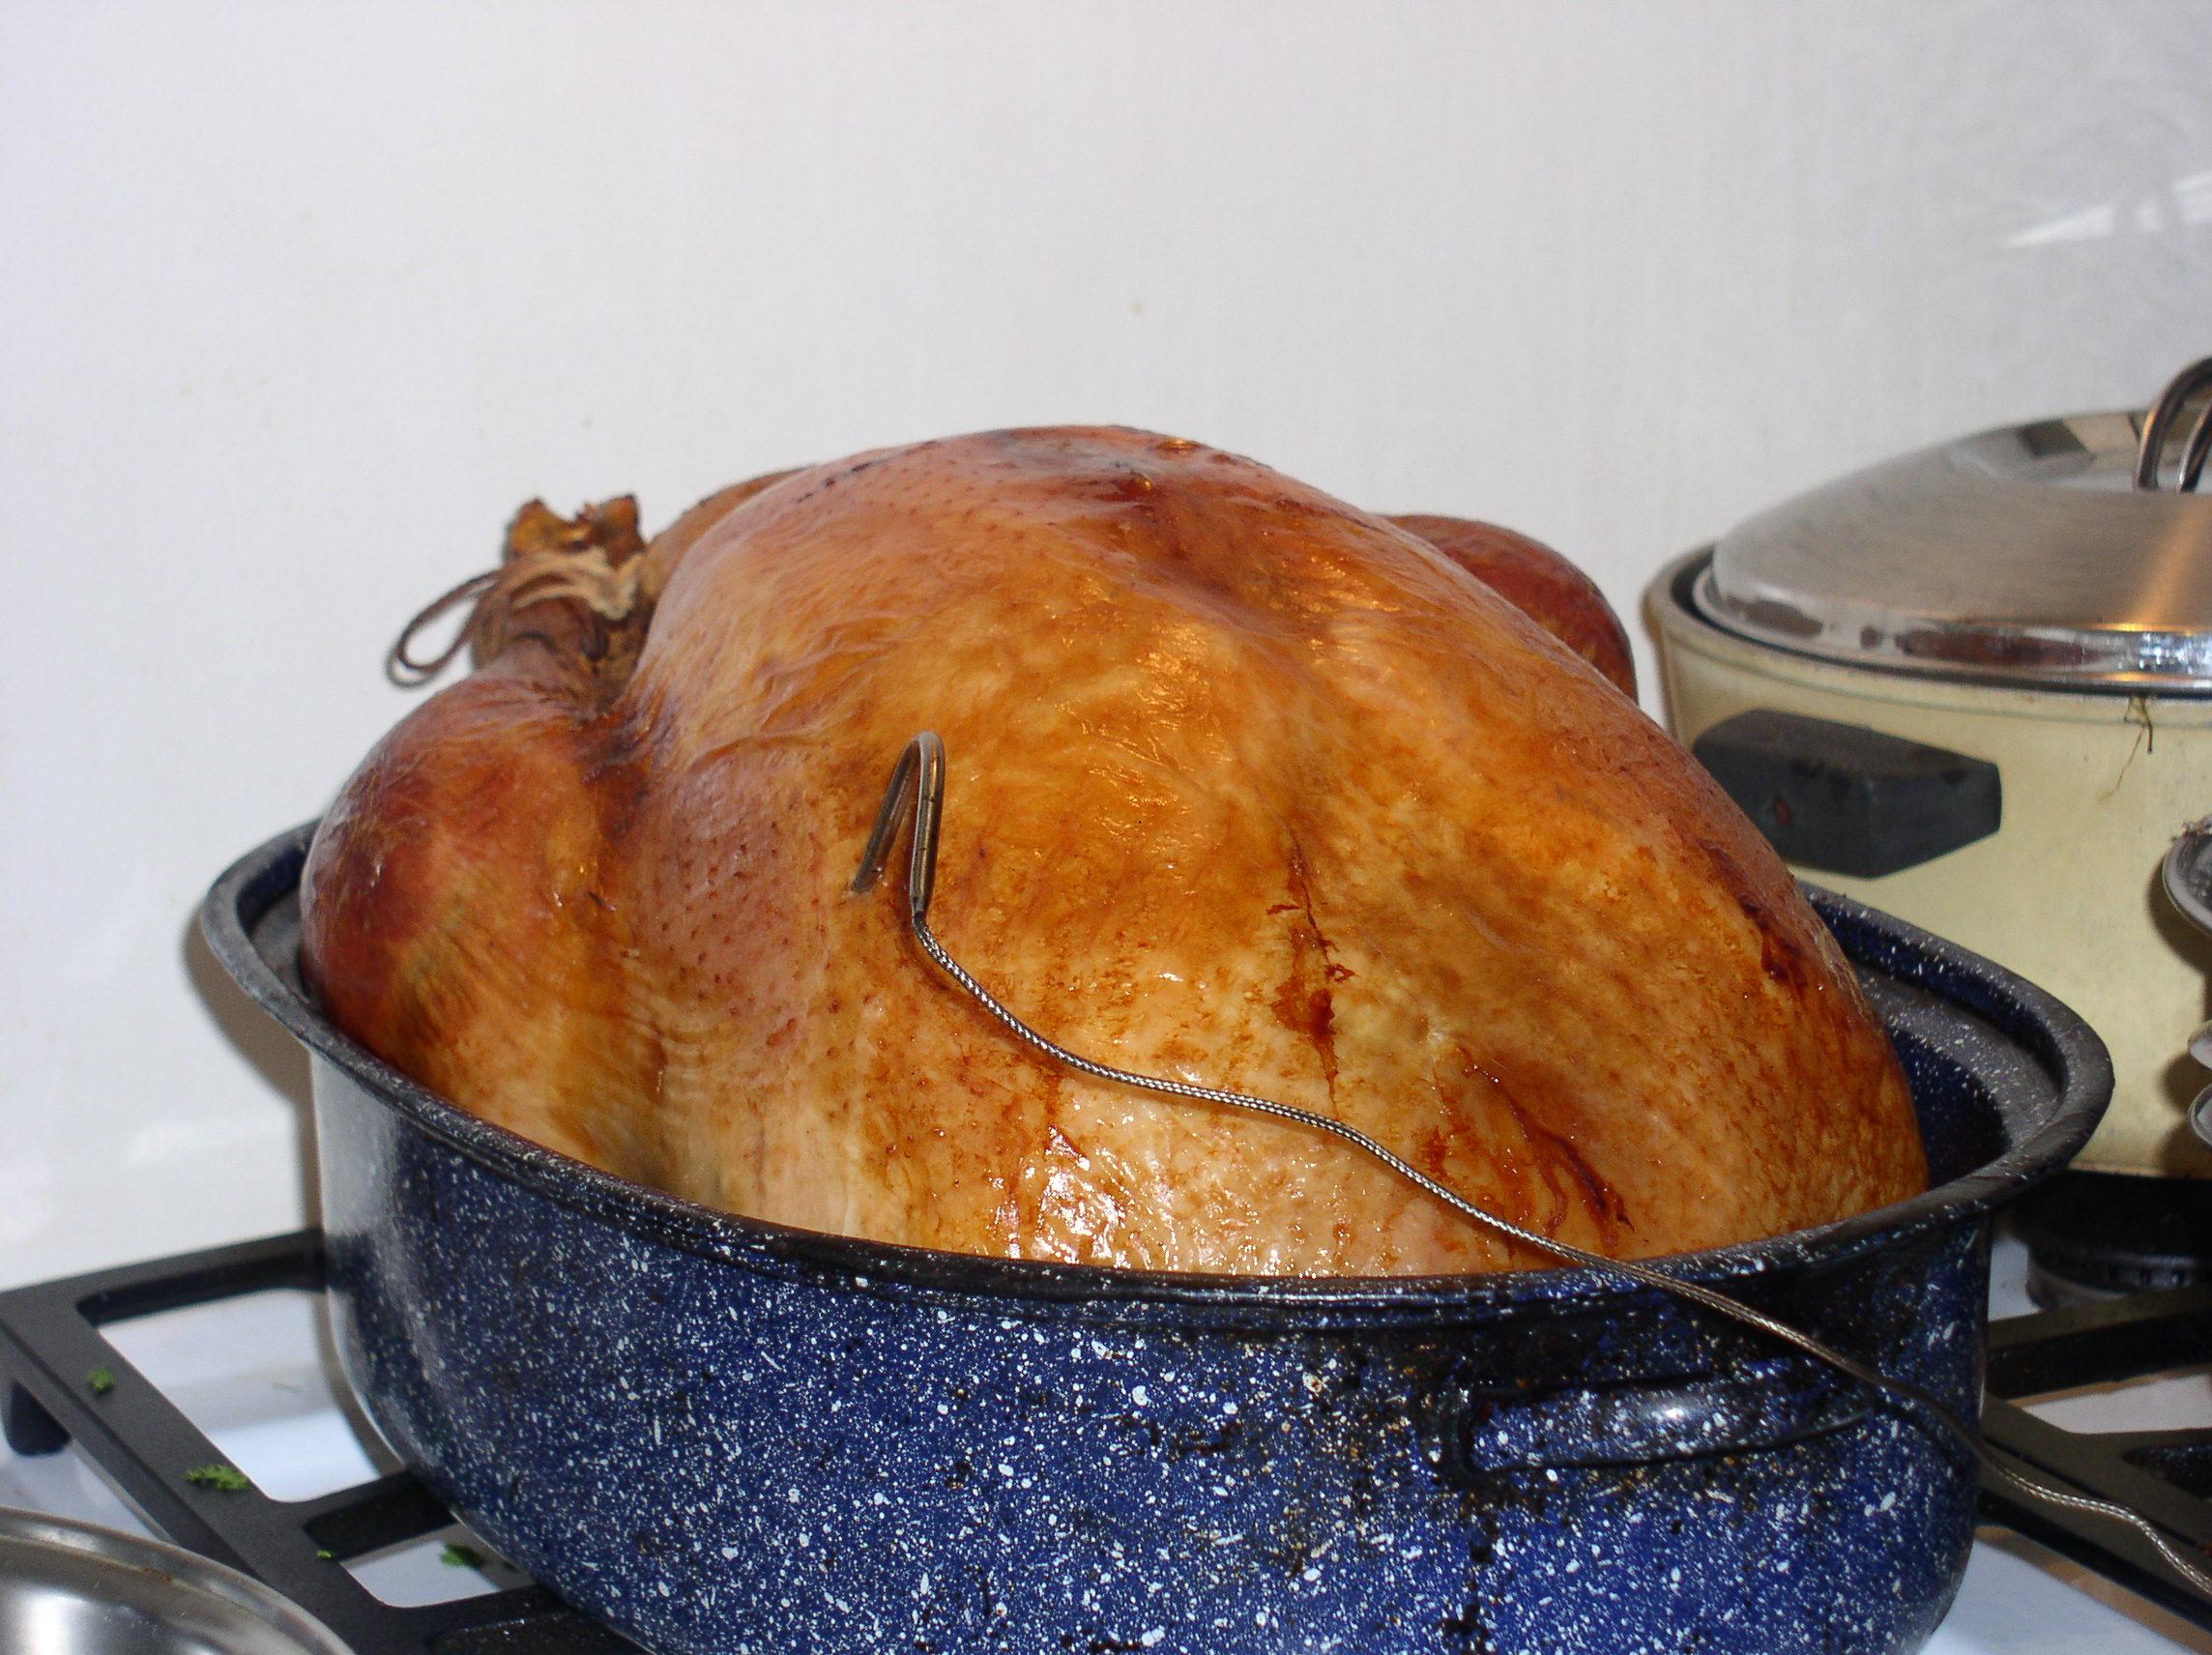 Virginia Dowd's Savory Sausage Stuffing